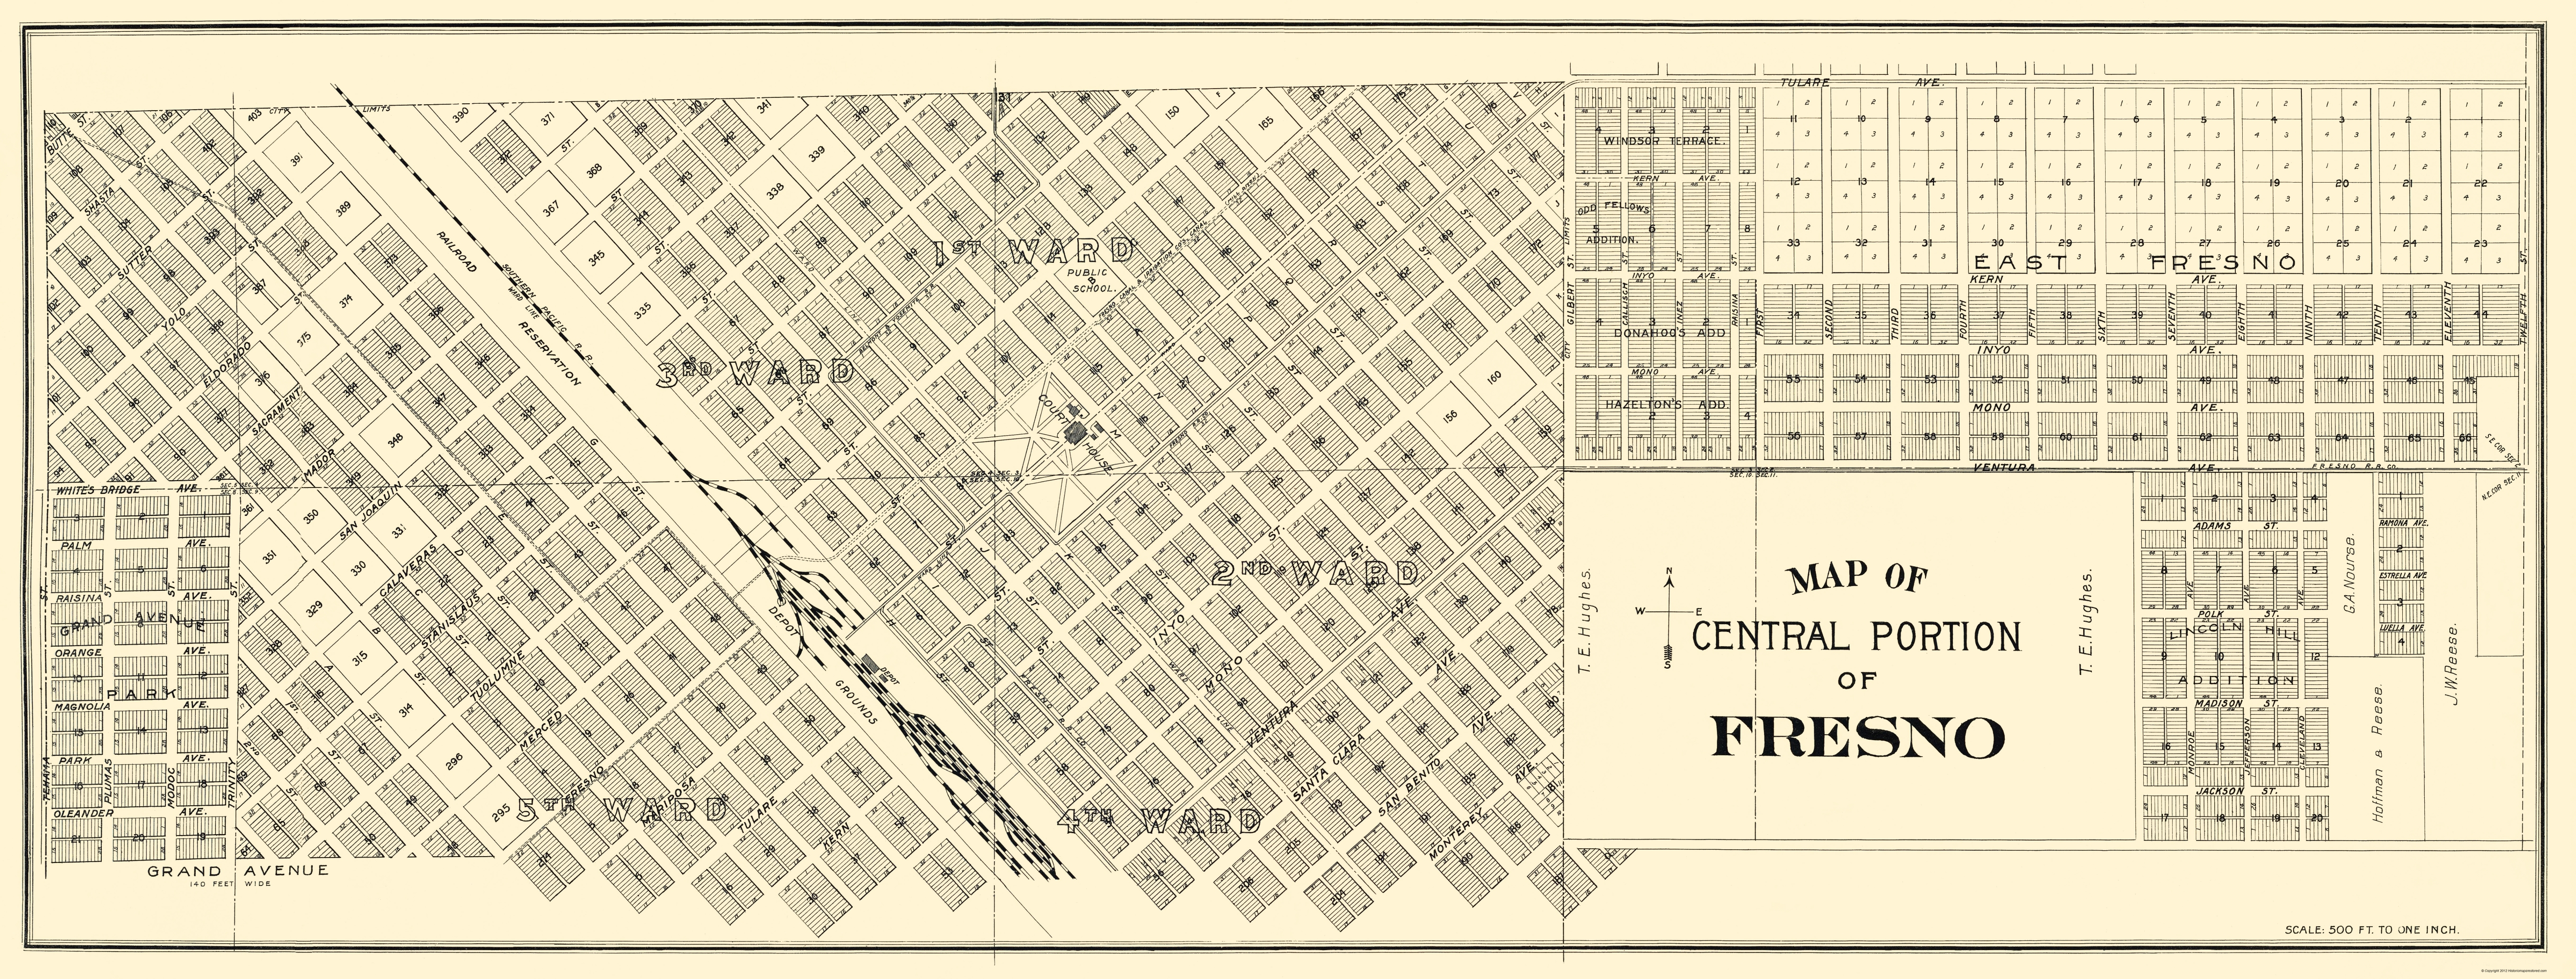 Old City Map - Fresno, Central California Landowner 1892 Map Of Fresno on